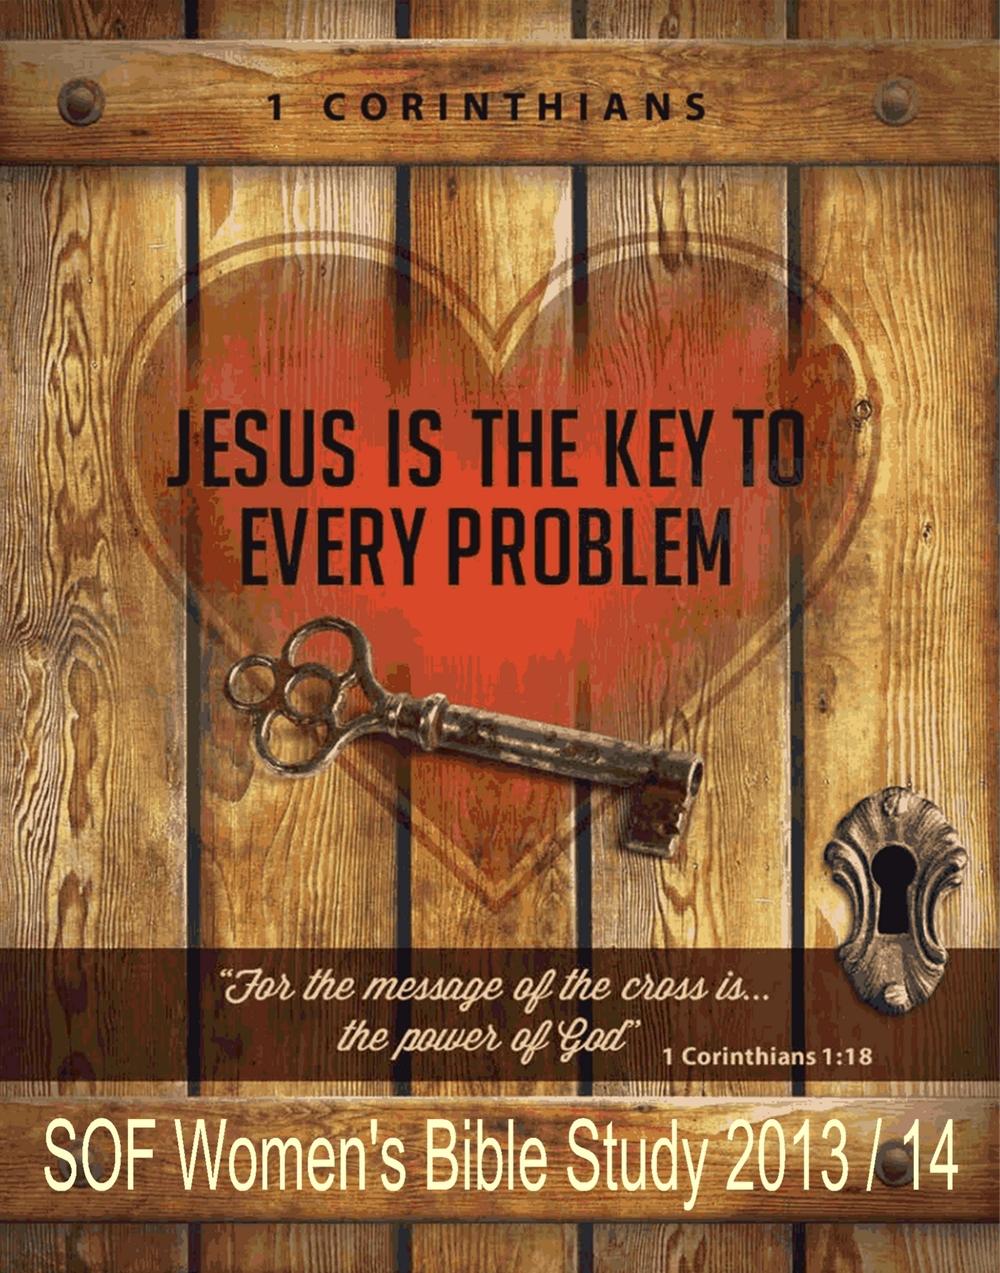 2013-2014 Bible Study